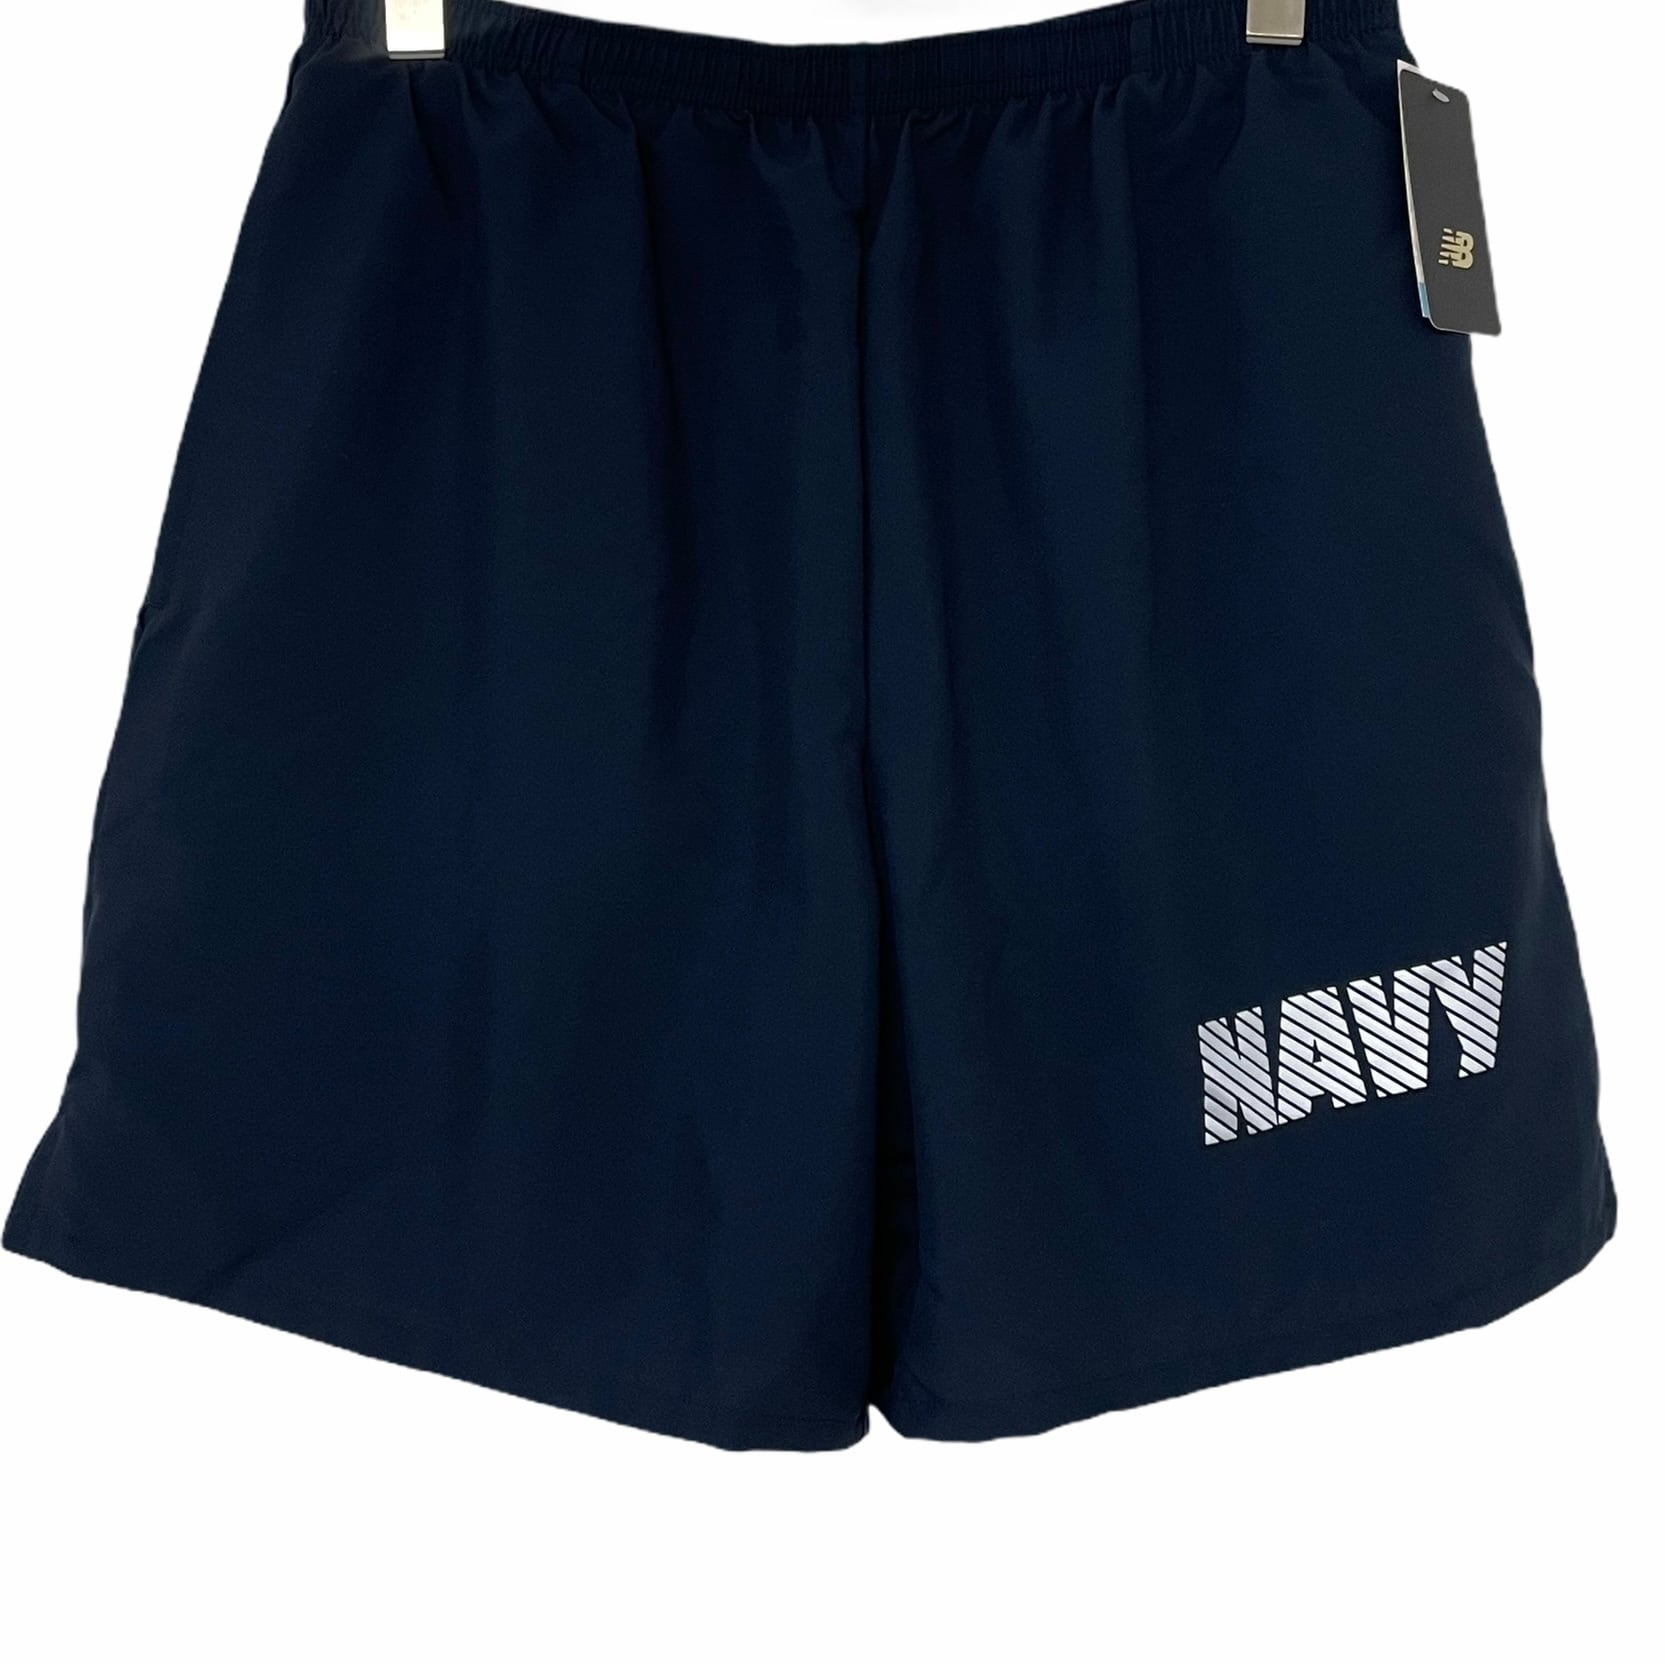 Dead Stock U.S.NAVY Training Shorts by New Balance